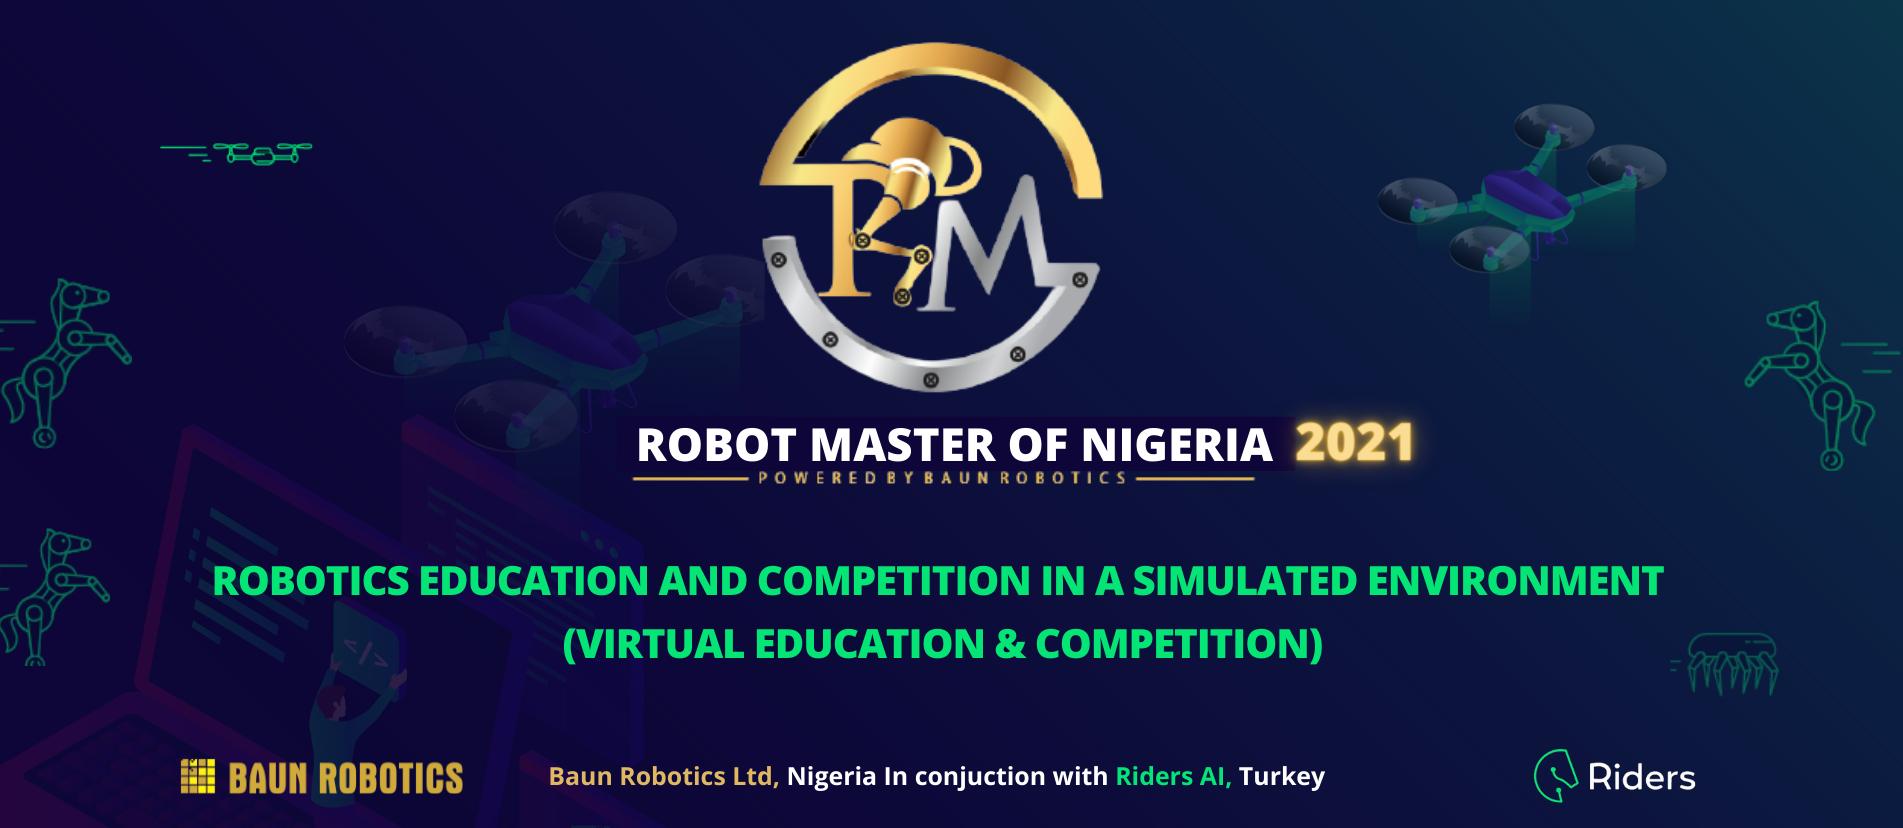 ROBOT-MASTER-OF-NIGERIA-COMPETITION HEADER